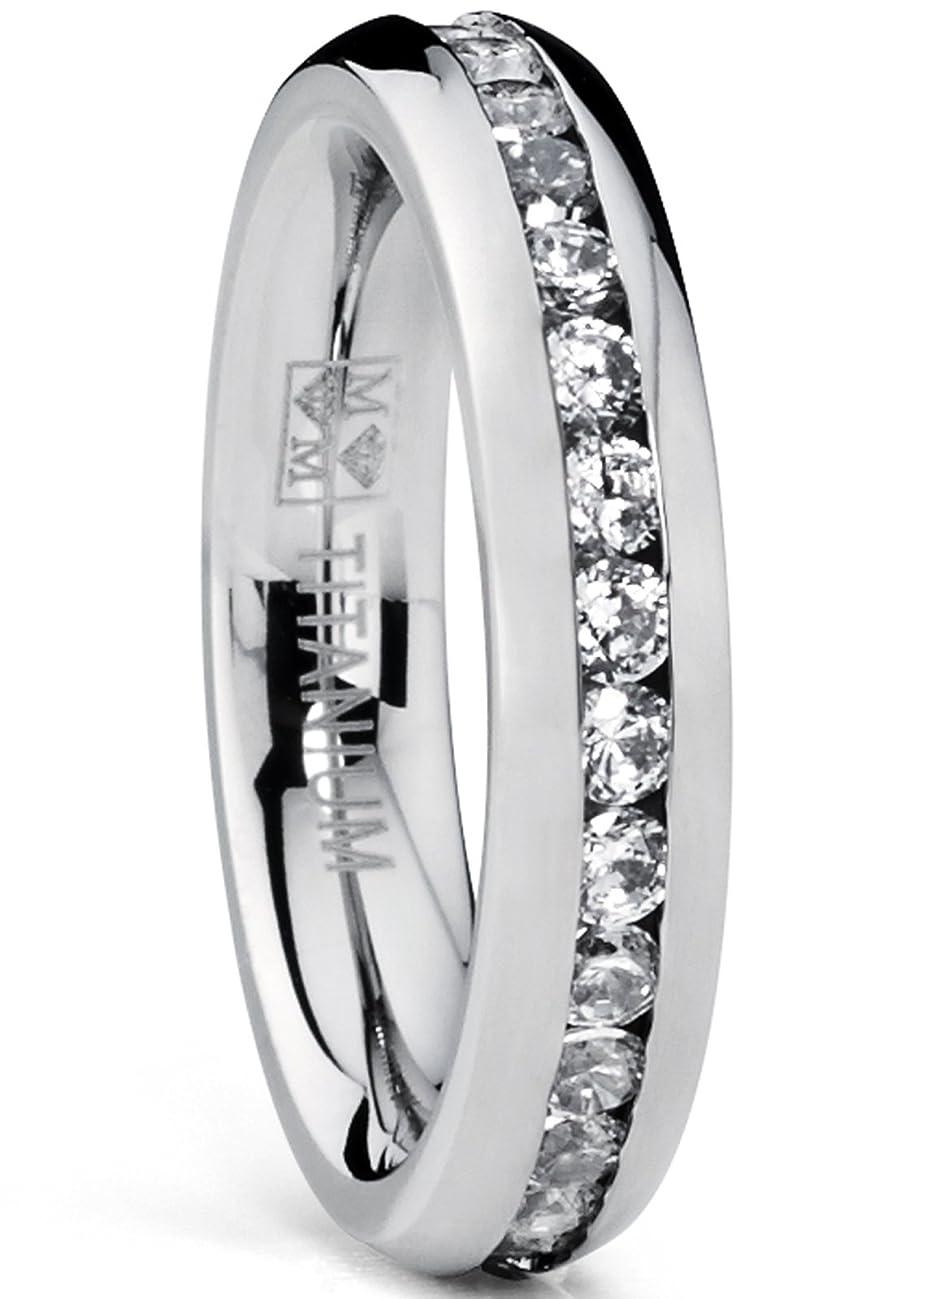 4MM High Polish Ladies Eternity Titanium Ring Wedding Band with Cubic Zirconia CZ Sizes 4 to 9